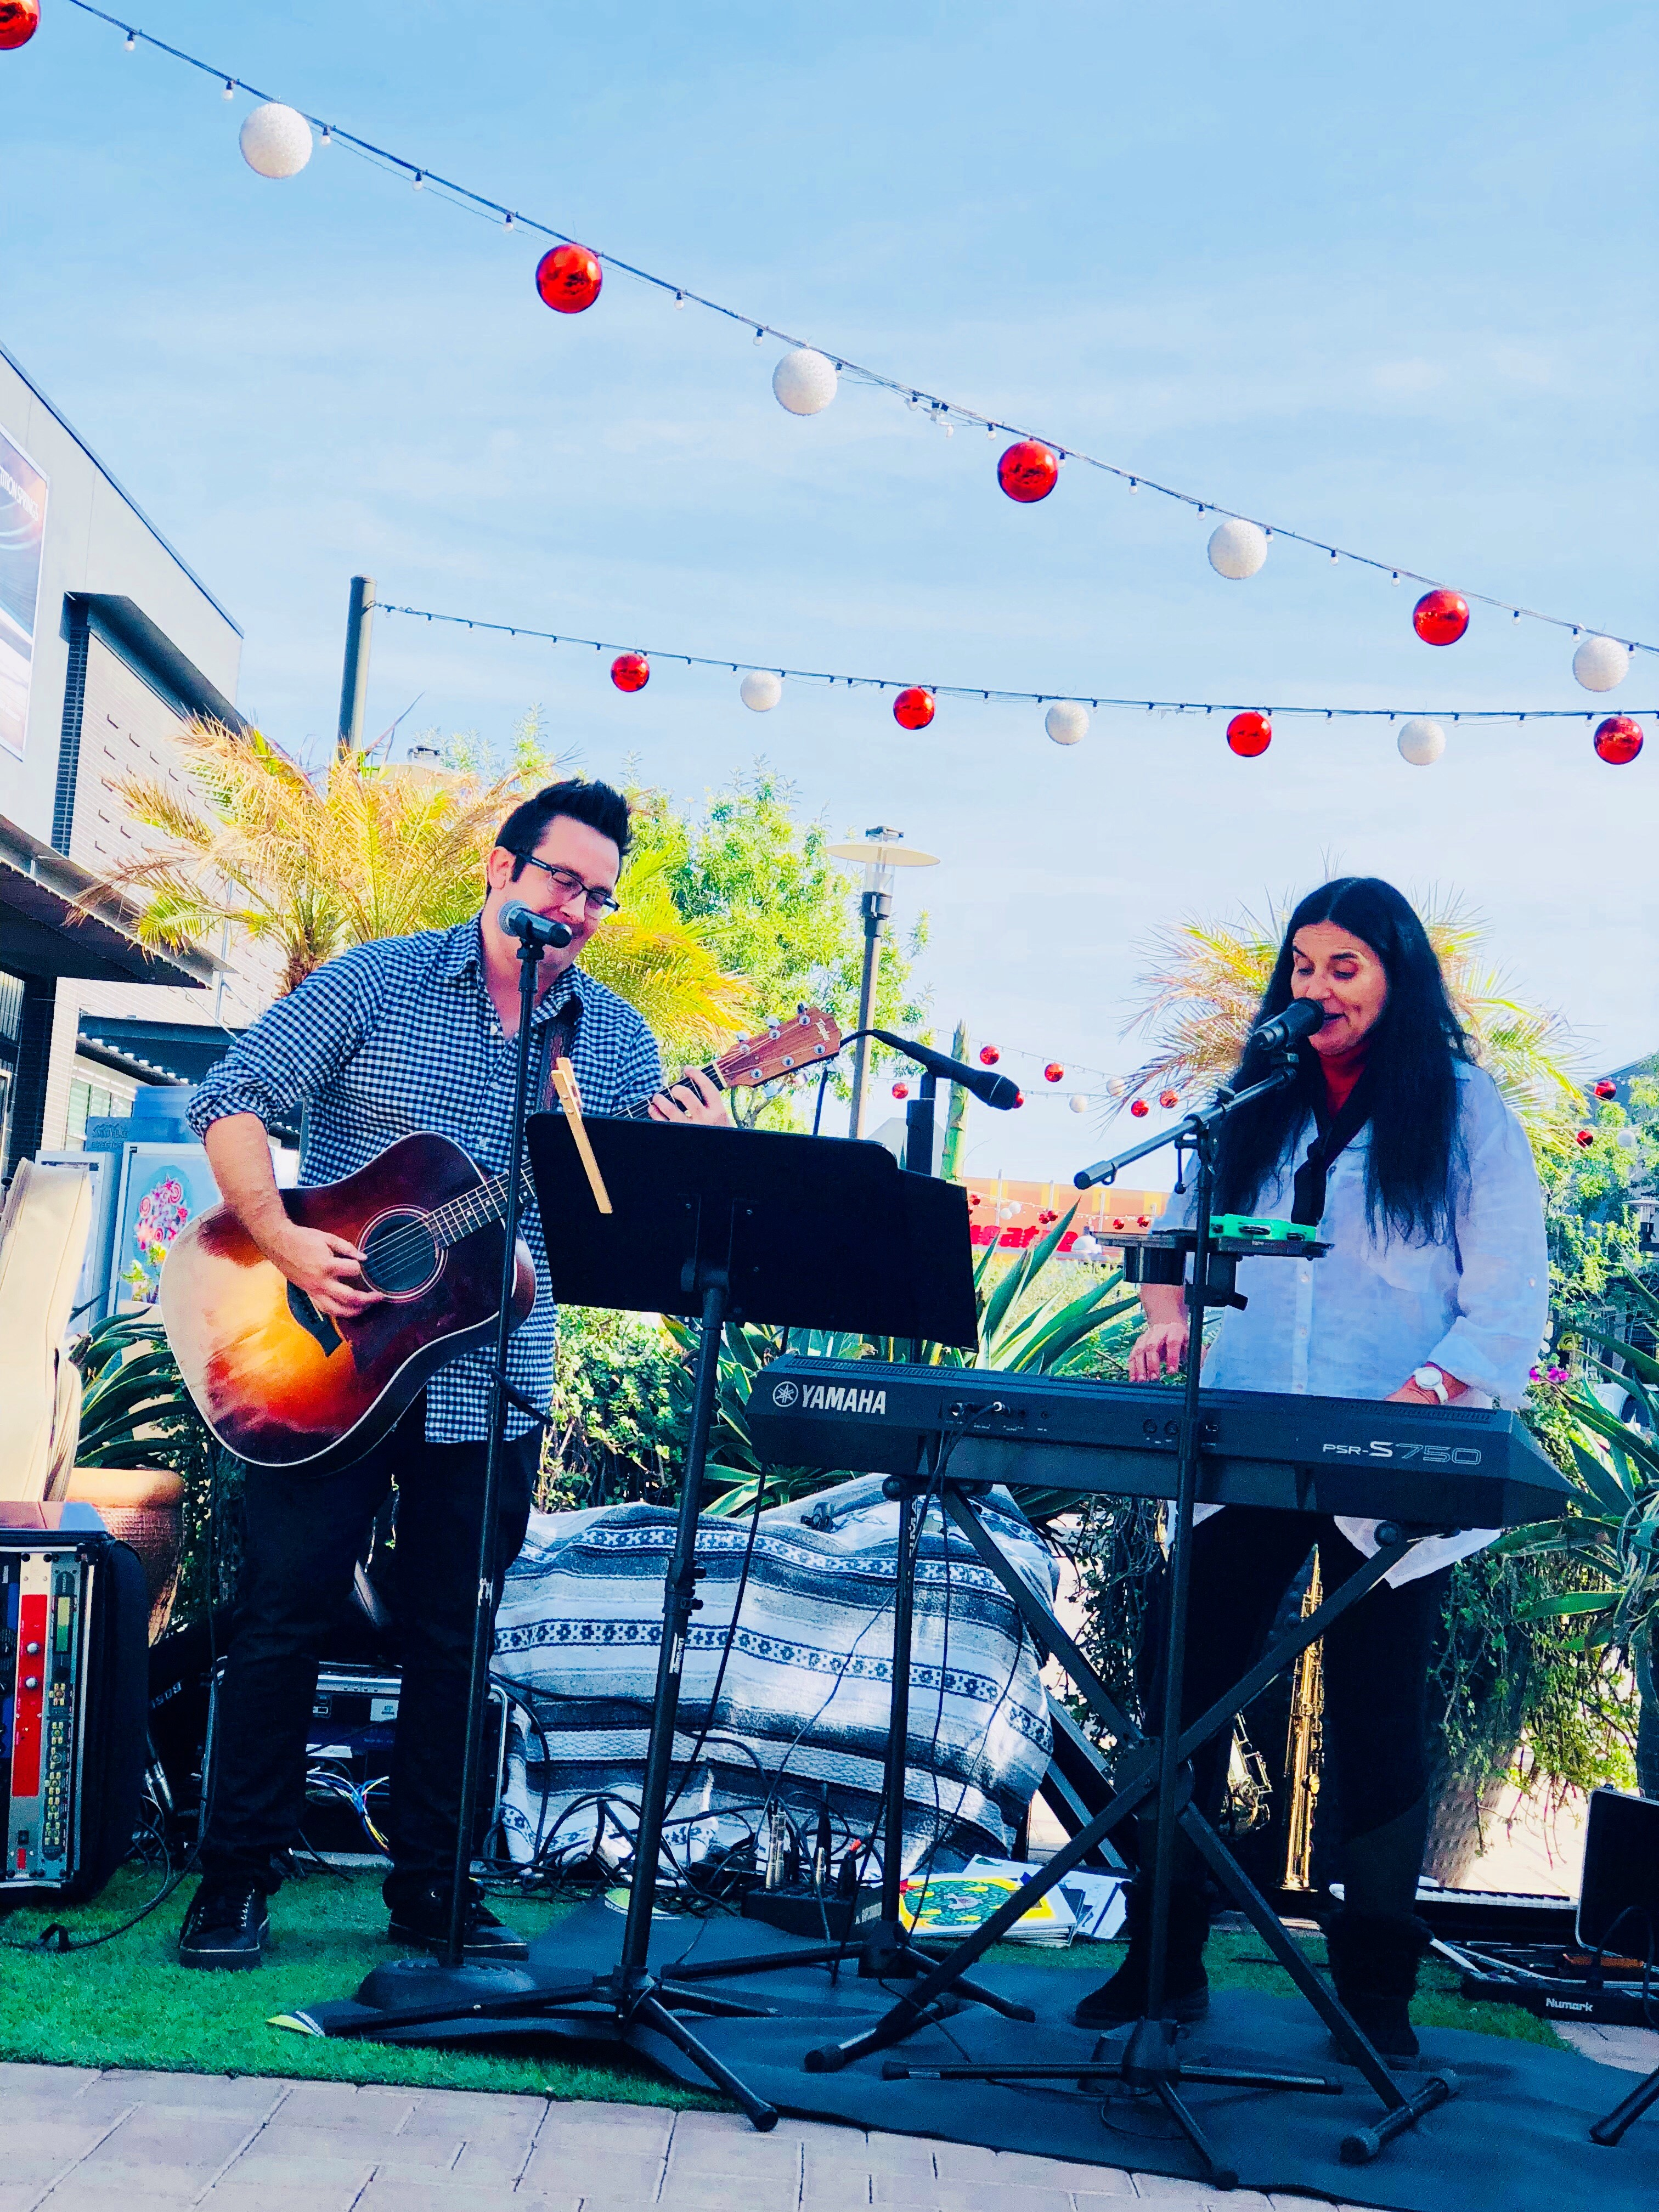 Guitarist and keyboard player singing holiday music.